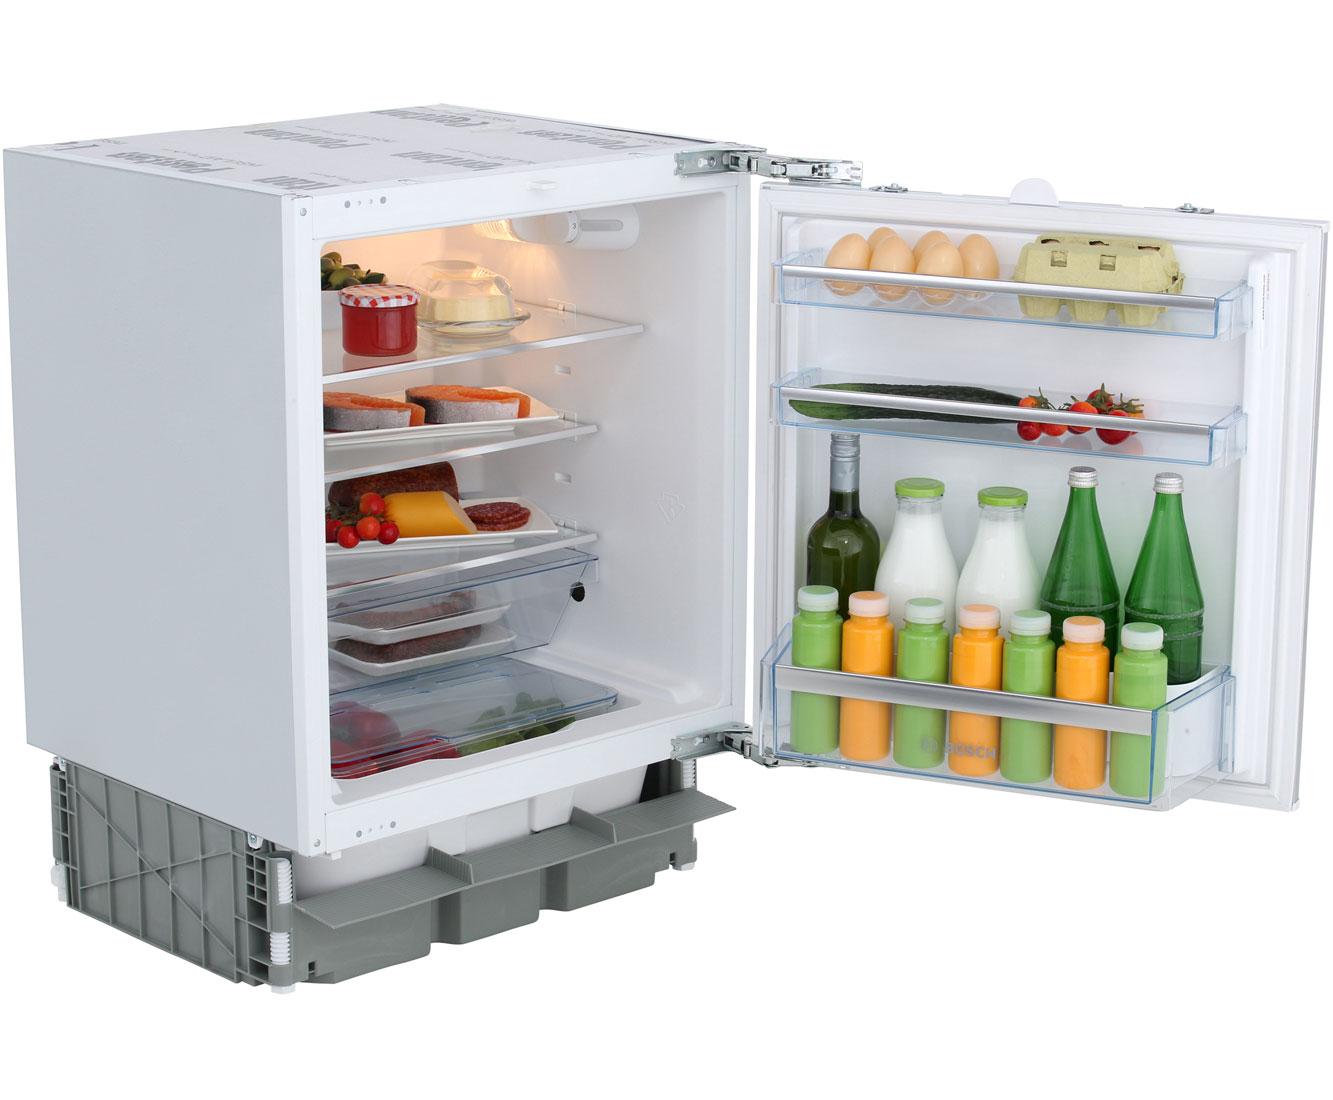 Amica Kühlschrank Dekorfähig : Amica uks unterbau kühlschrank cm dekorfähig